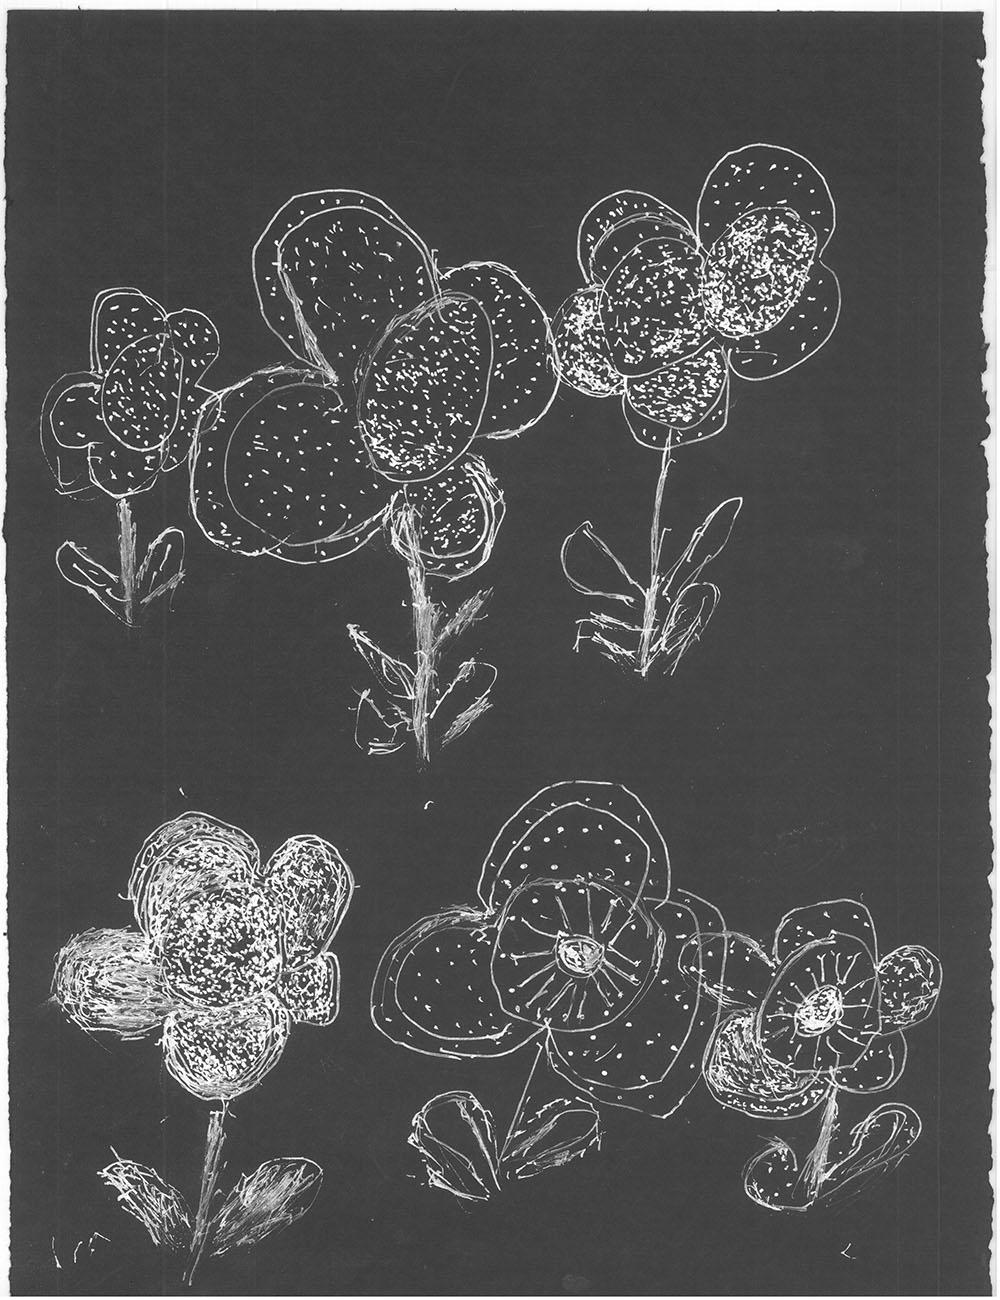 Darrel Davis, Untitled, Work on paper